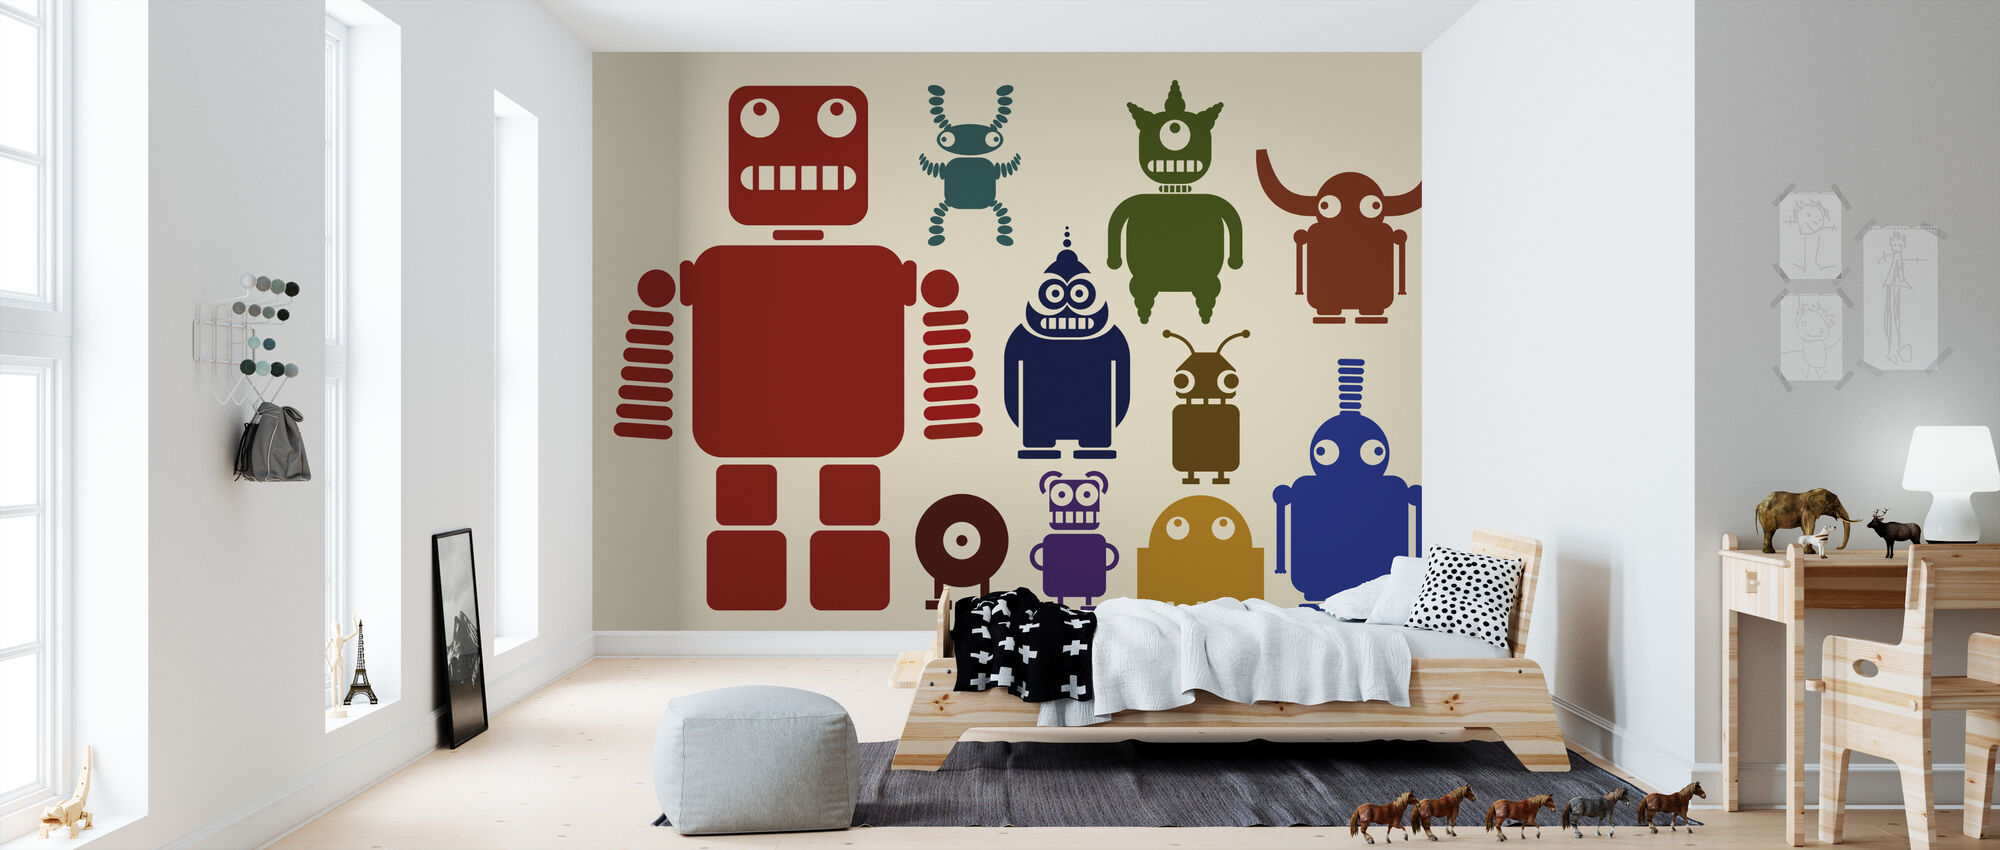 Team of Robots - Wallpaper - Kids Room